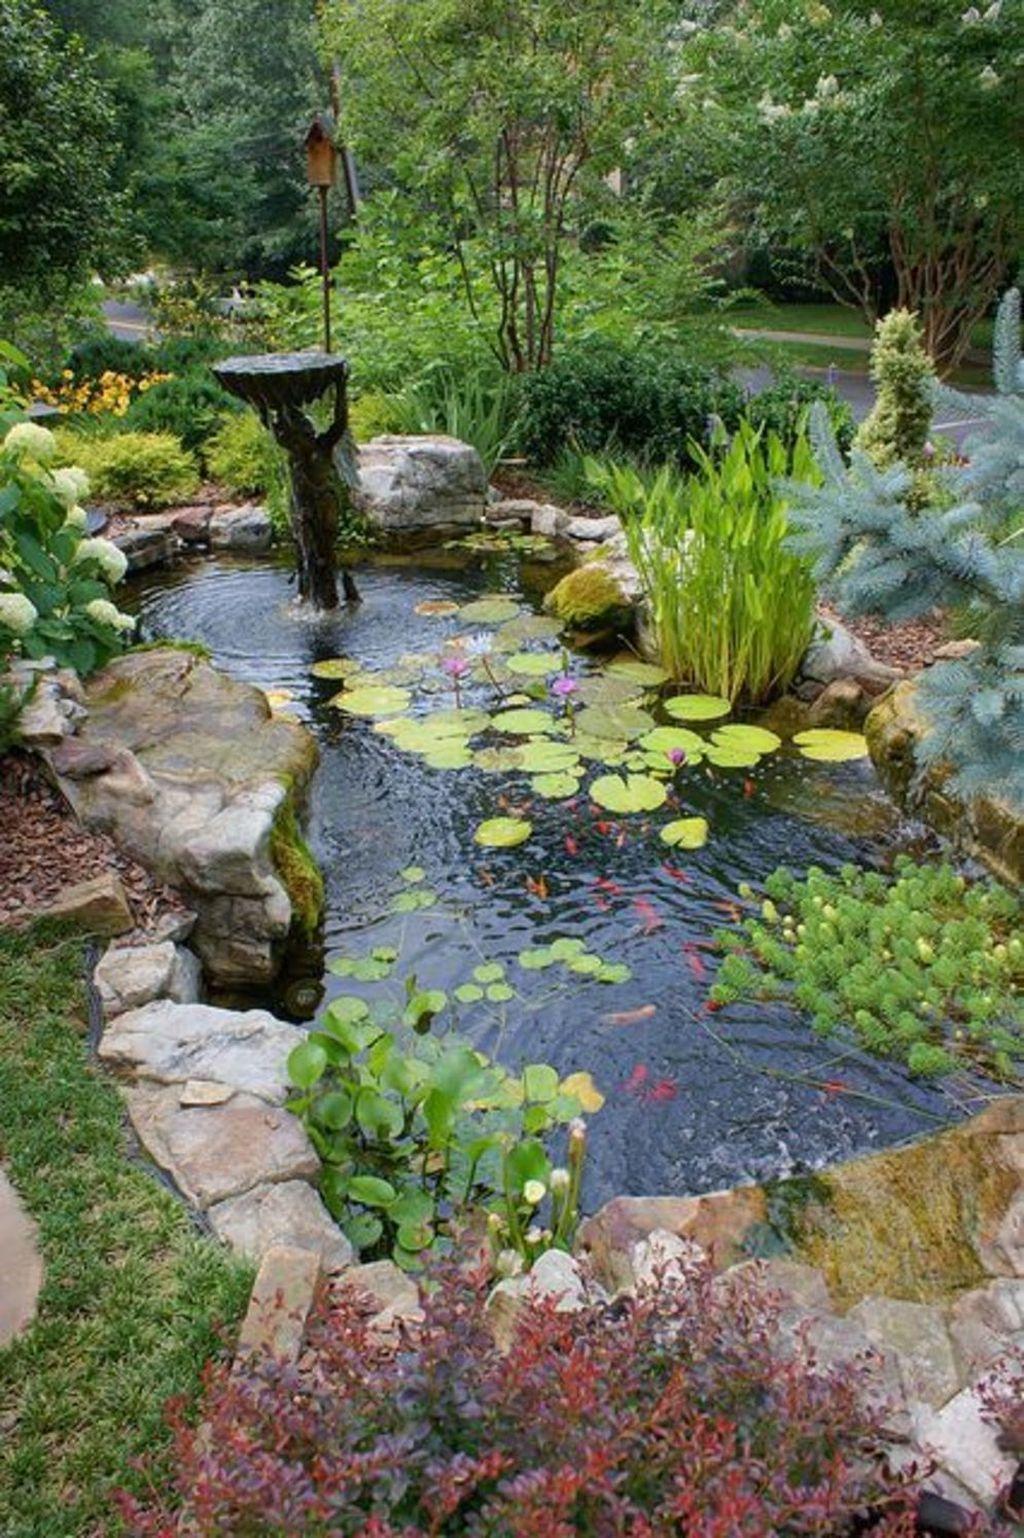 Cool Fish Pond Garden Landscaping Ideas For Backyard 01 Small Water Gardens Small Garden Landscape Garden Pond Design